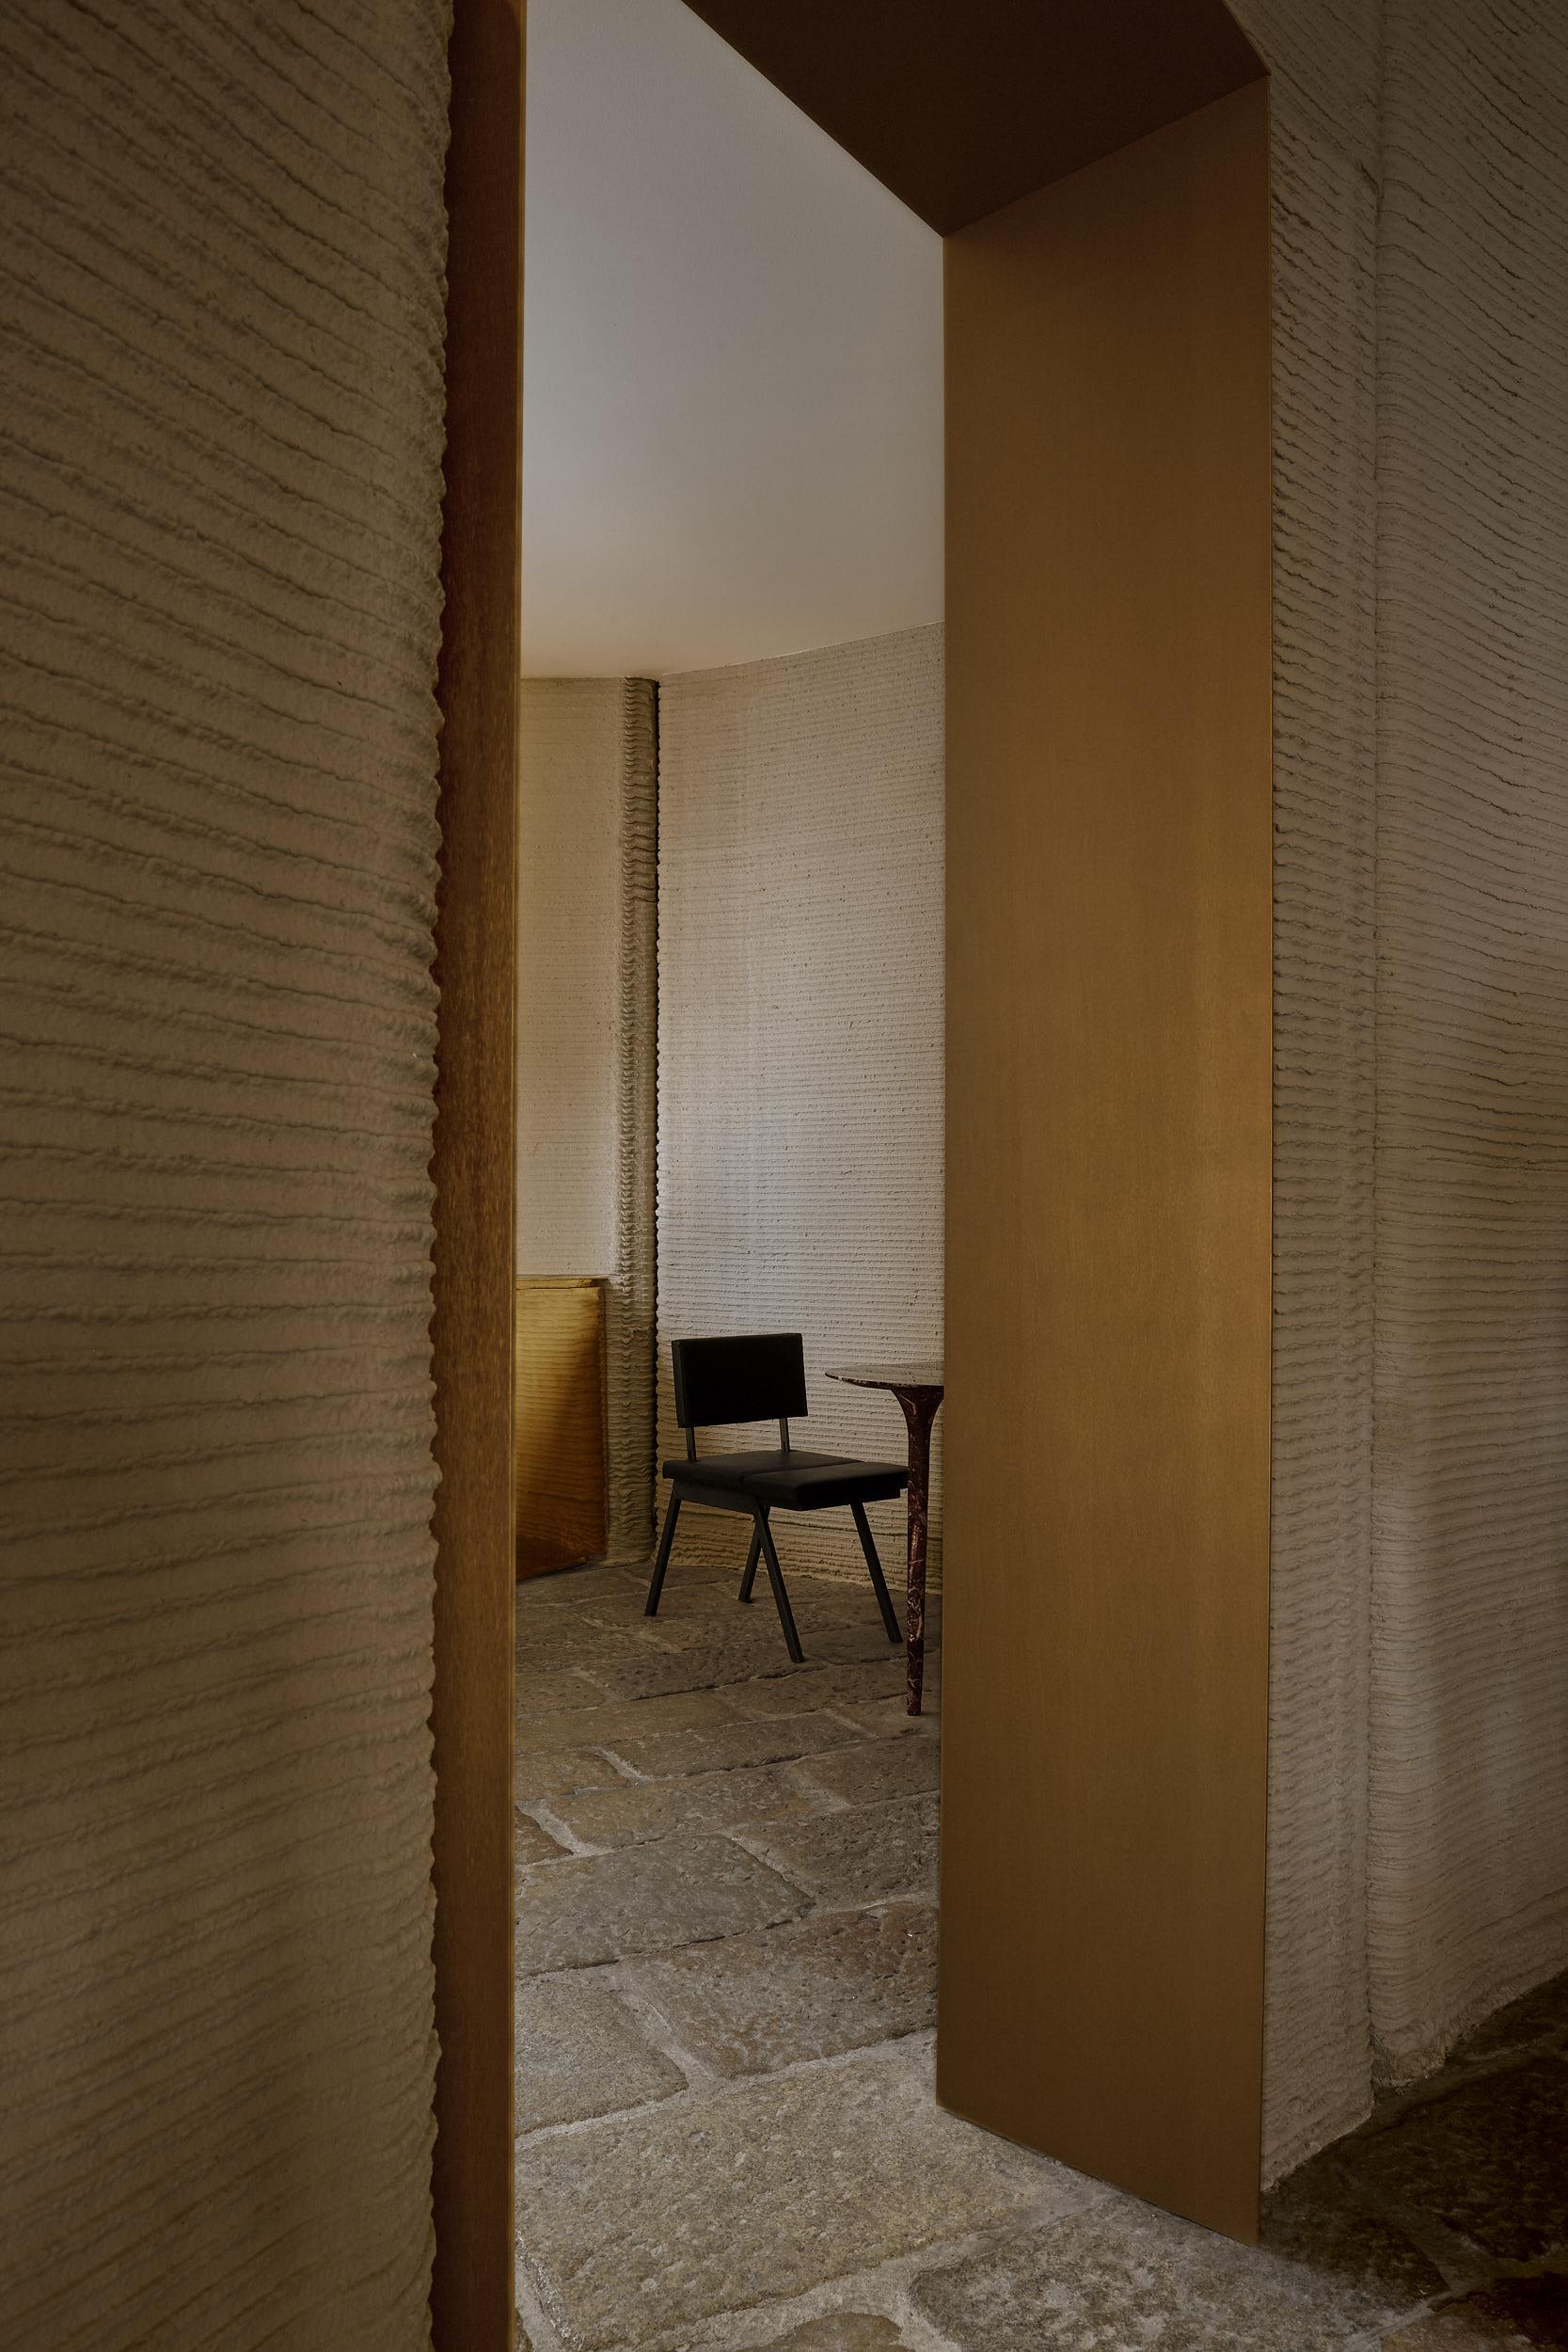 3D Housing 05 by CLS Architetti on Anniversary Magazine. Photo by Alex Lesage — threefold 7.jpg